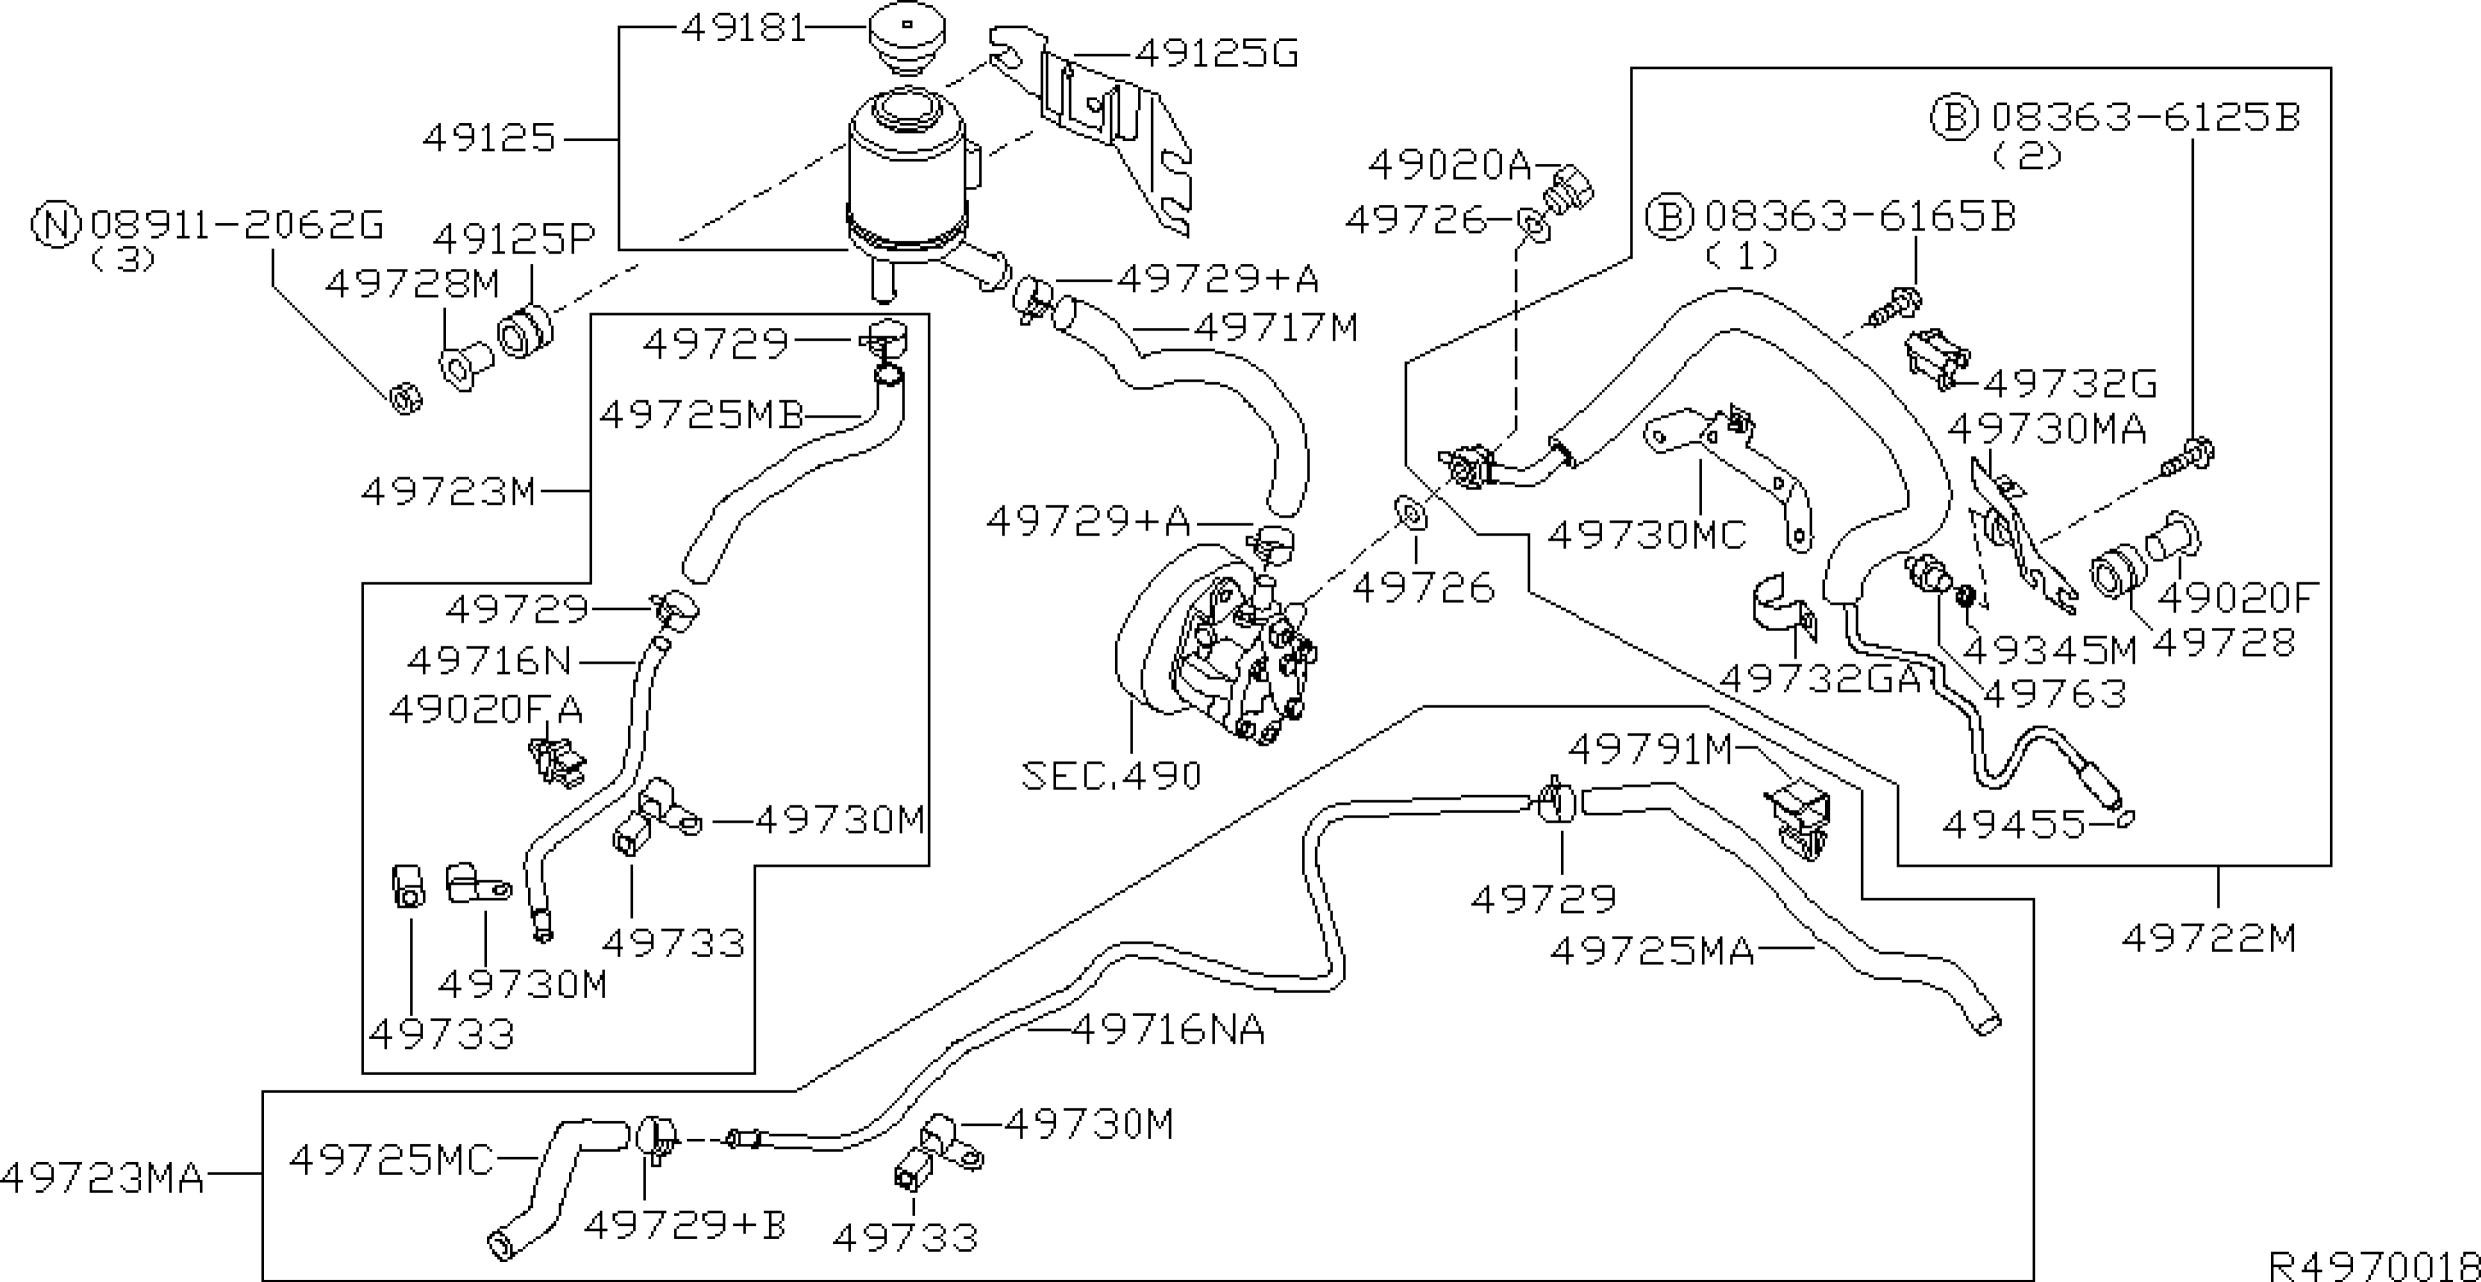 2004 Nissan Titan Engine Diagram 2004 Nissan Altima Sedan Oem Parts Nissan Usa Estore Of 2004 Nissan Titan Engine Diagram